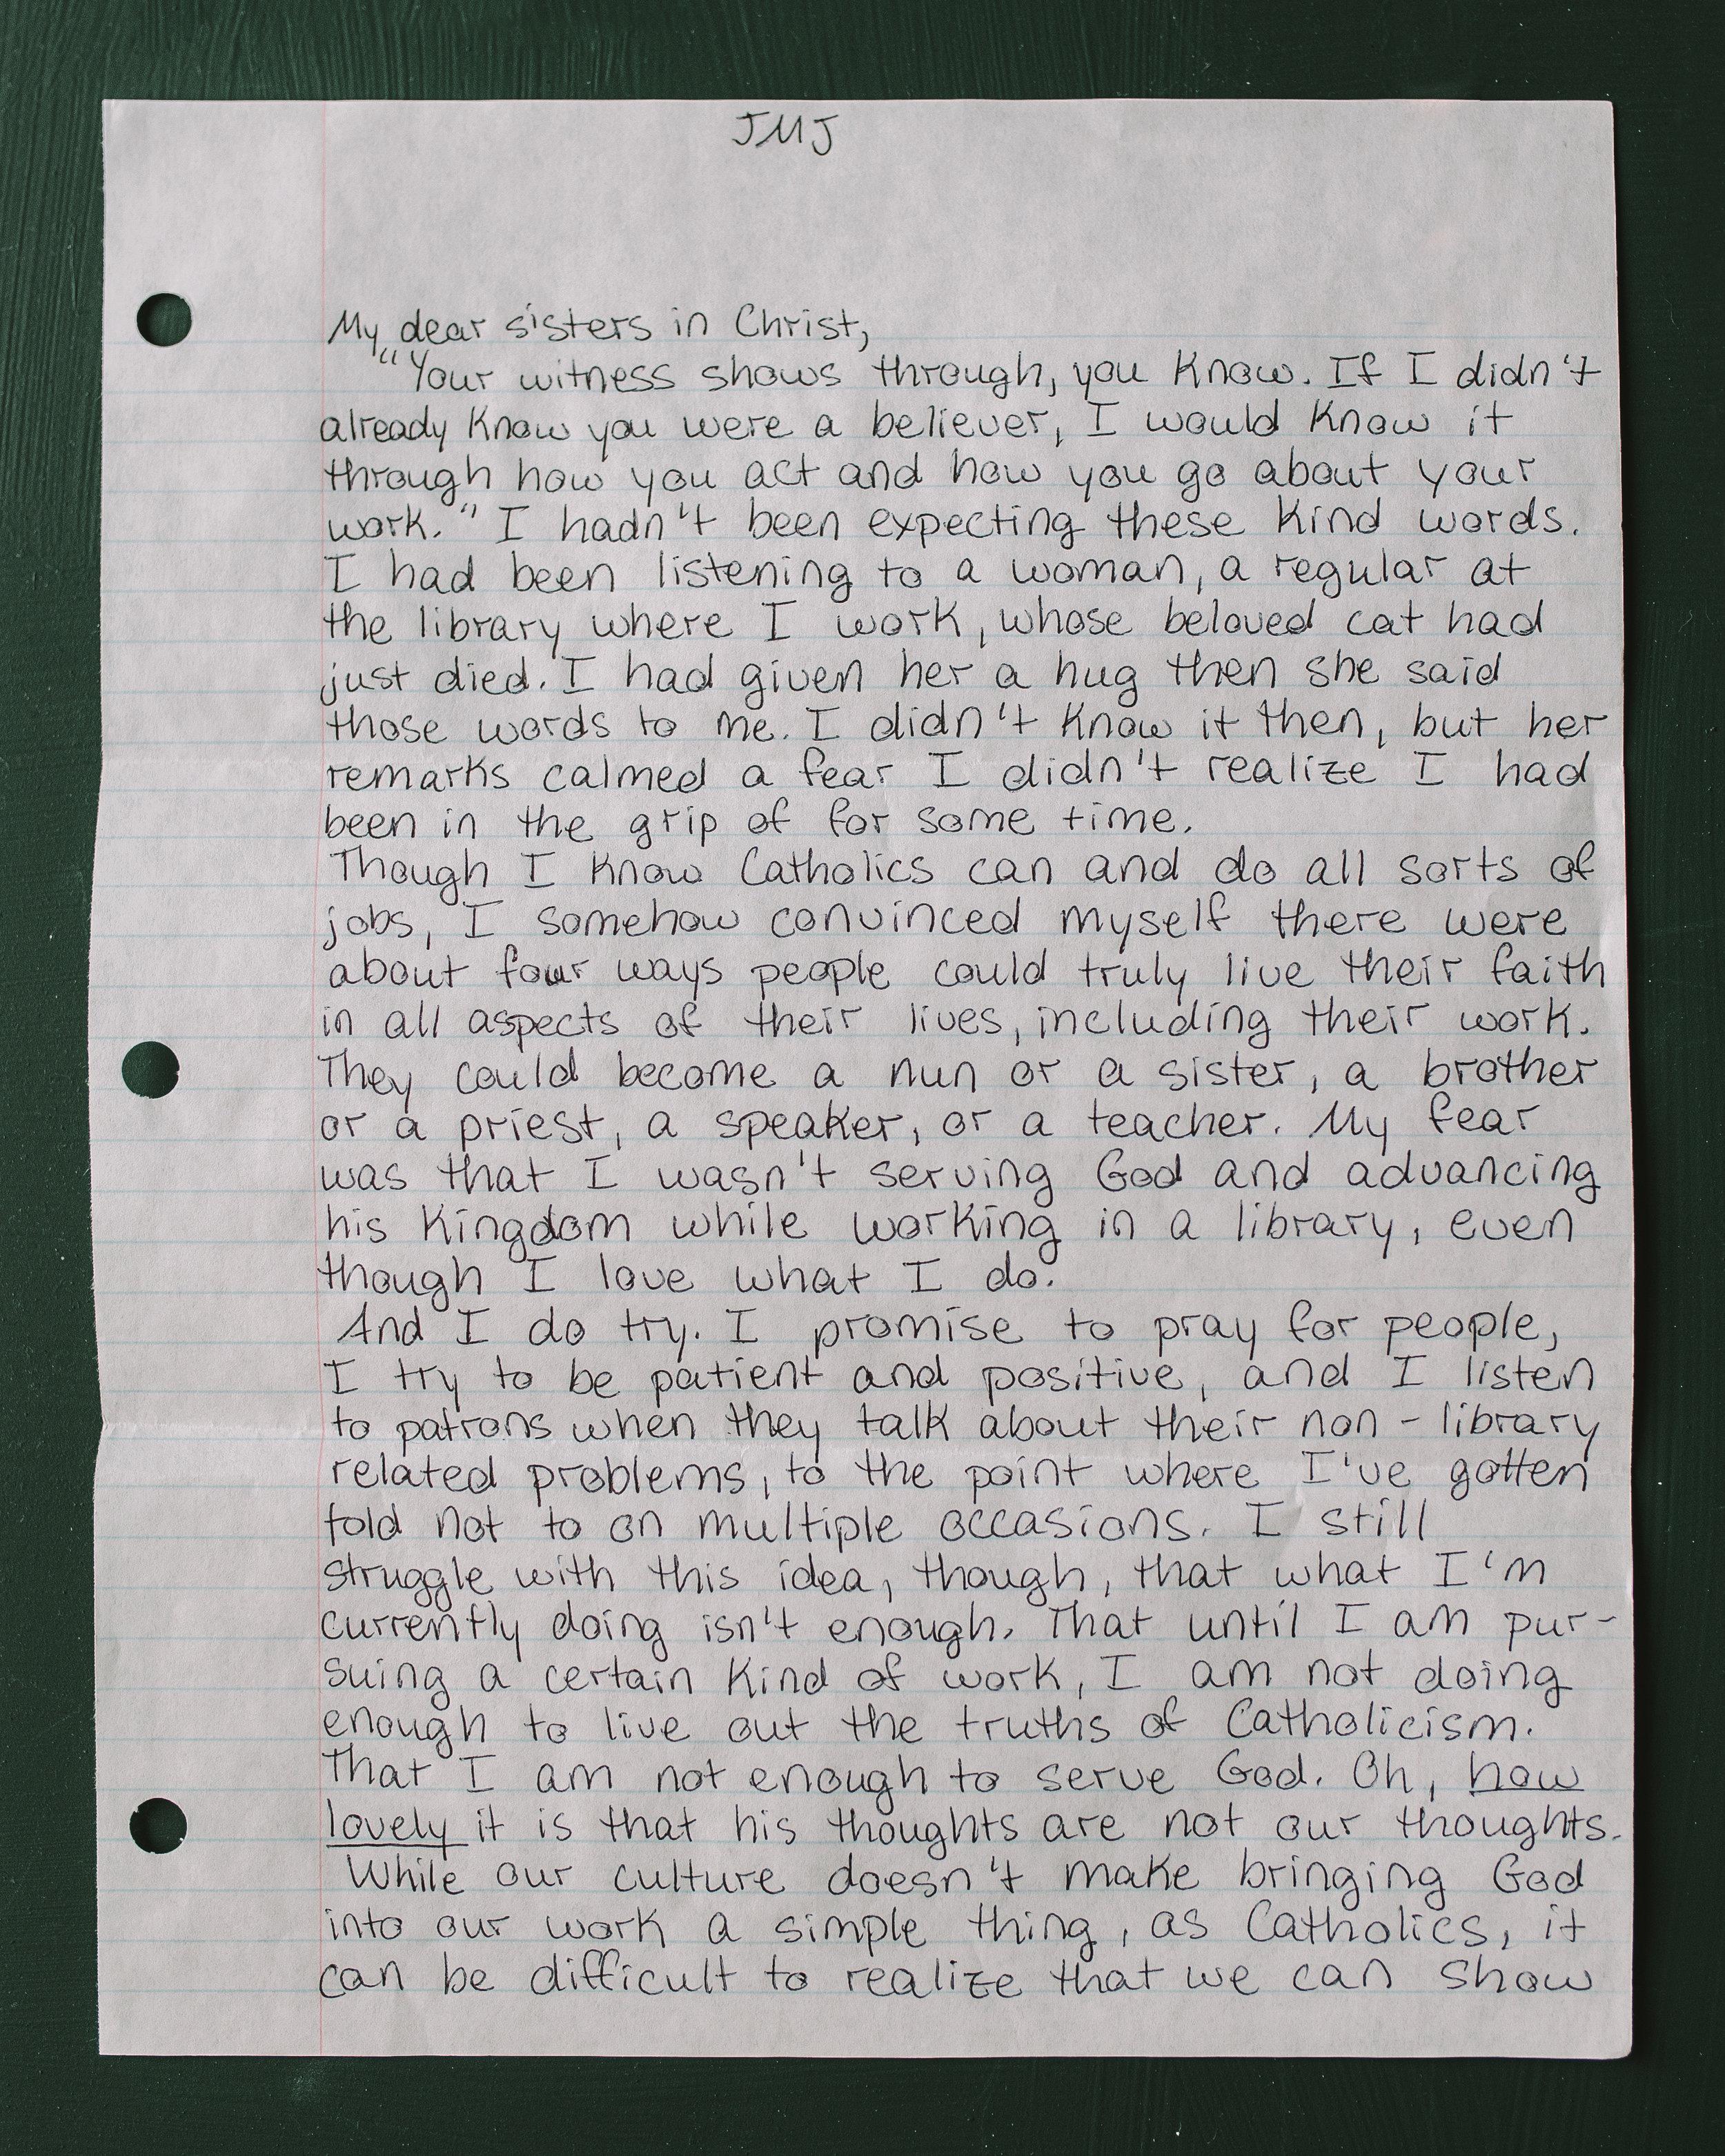 Elizabeth Hoyle Letter to Women 1